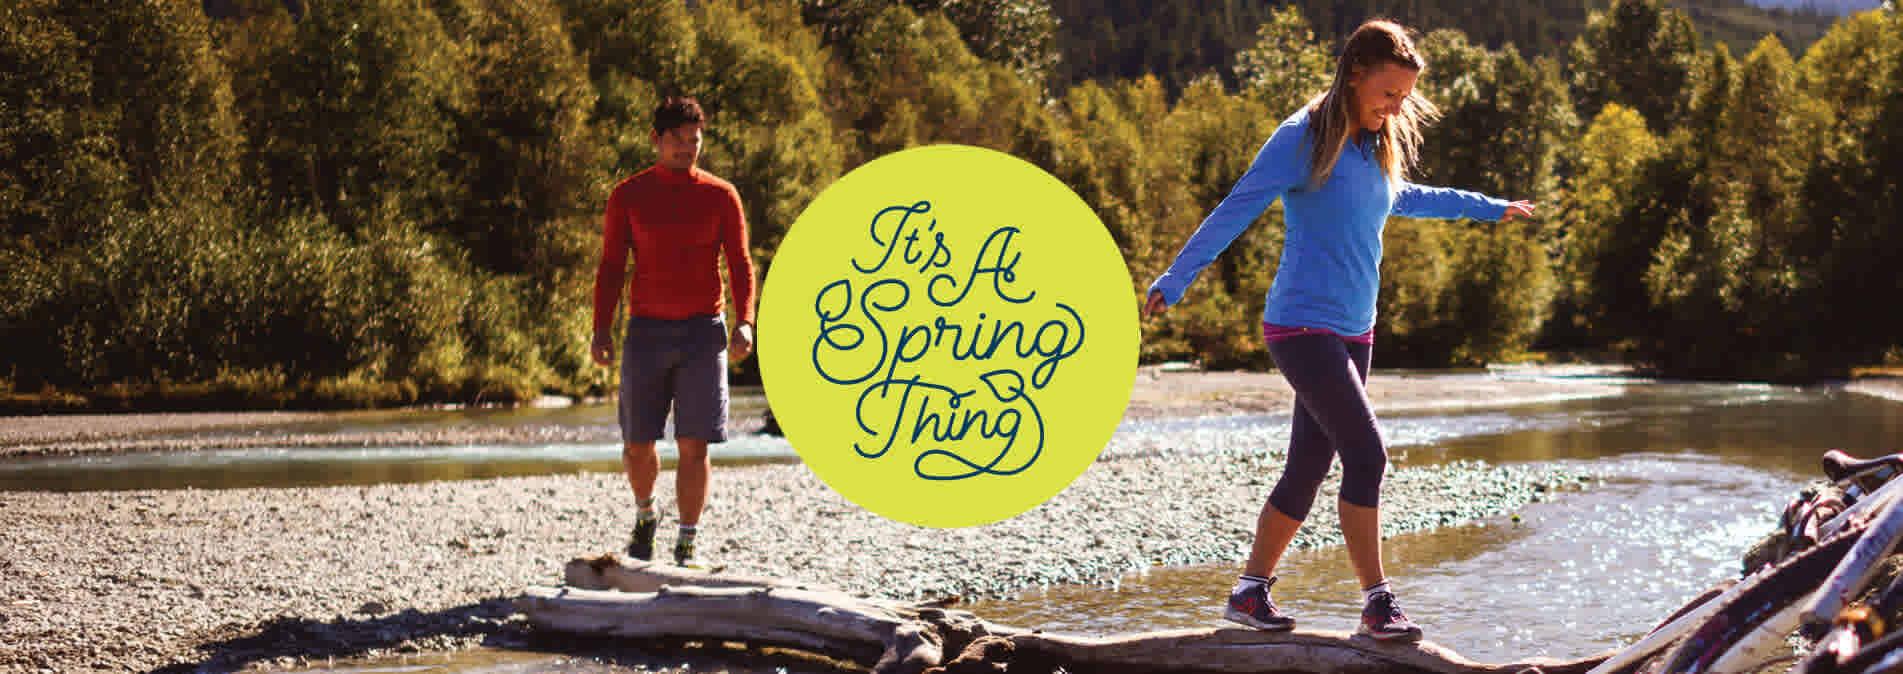 Whistler Family Spring Skiing Deals